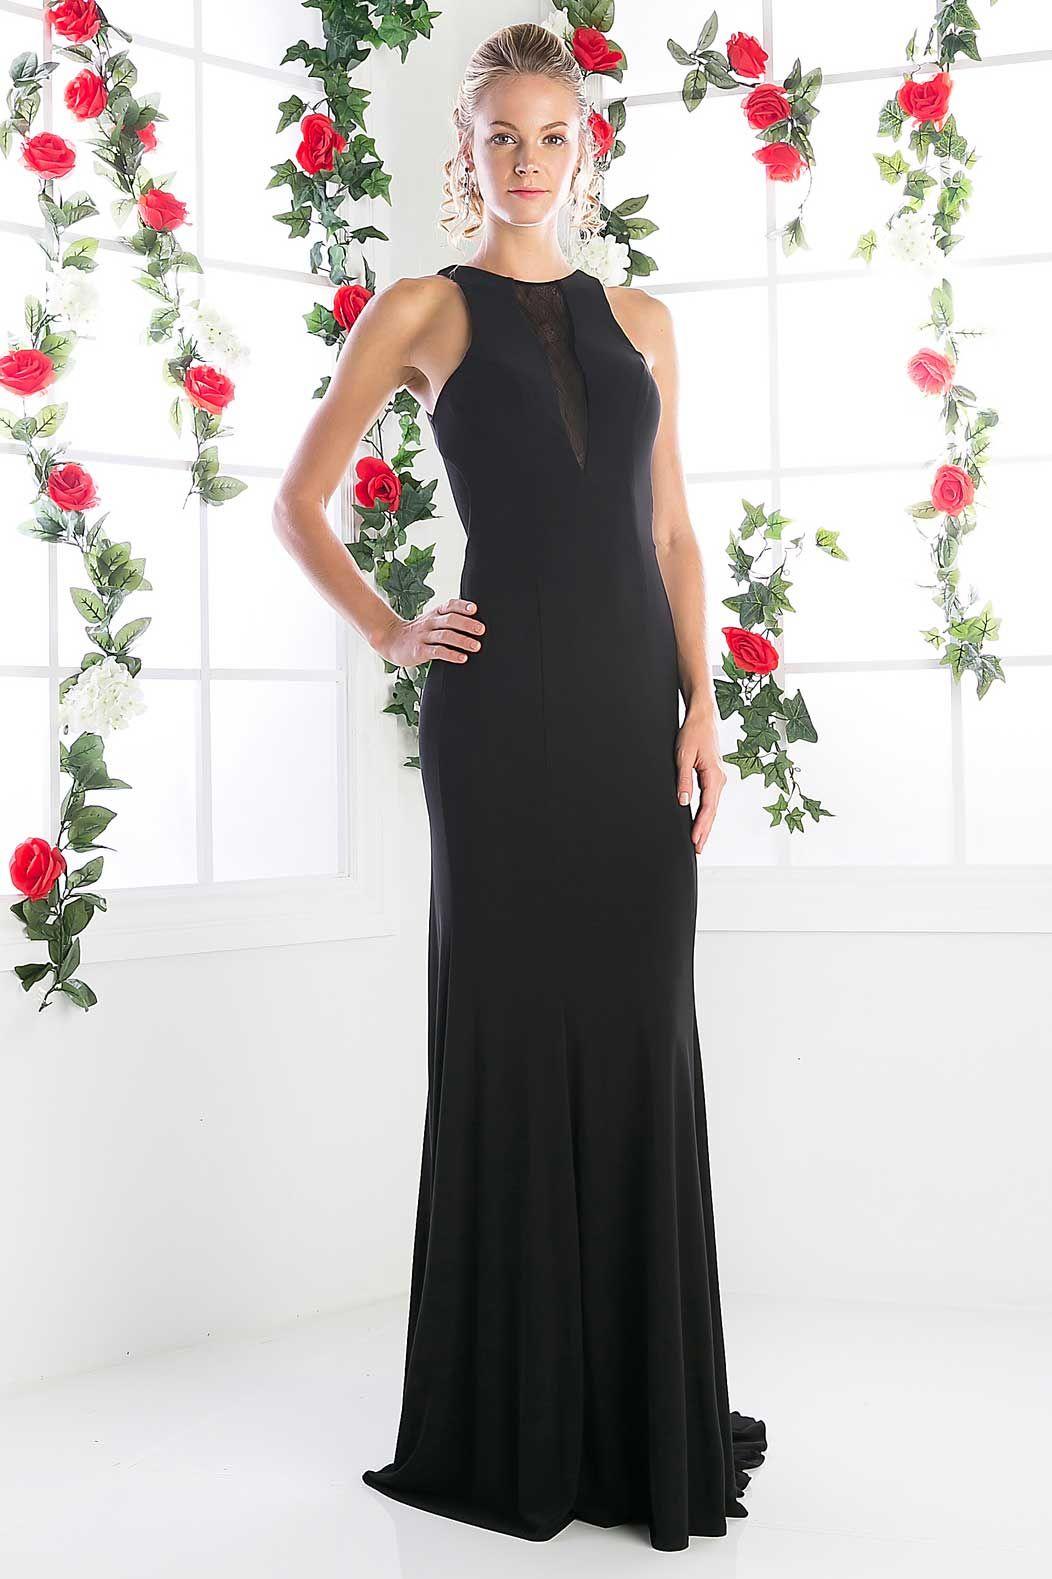 Evening long dress cdck solid color floor length sheath shape